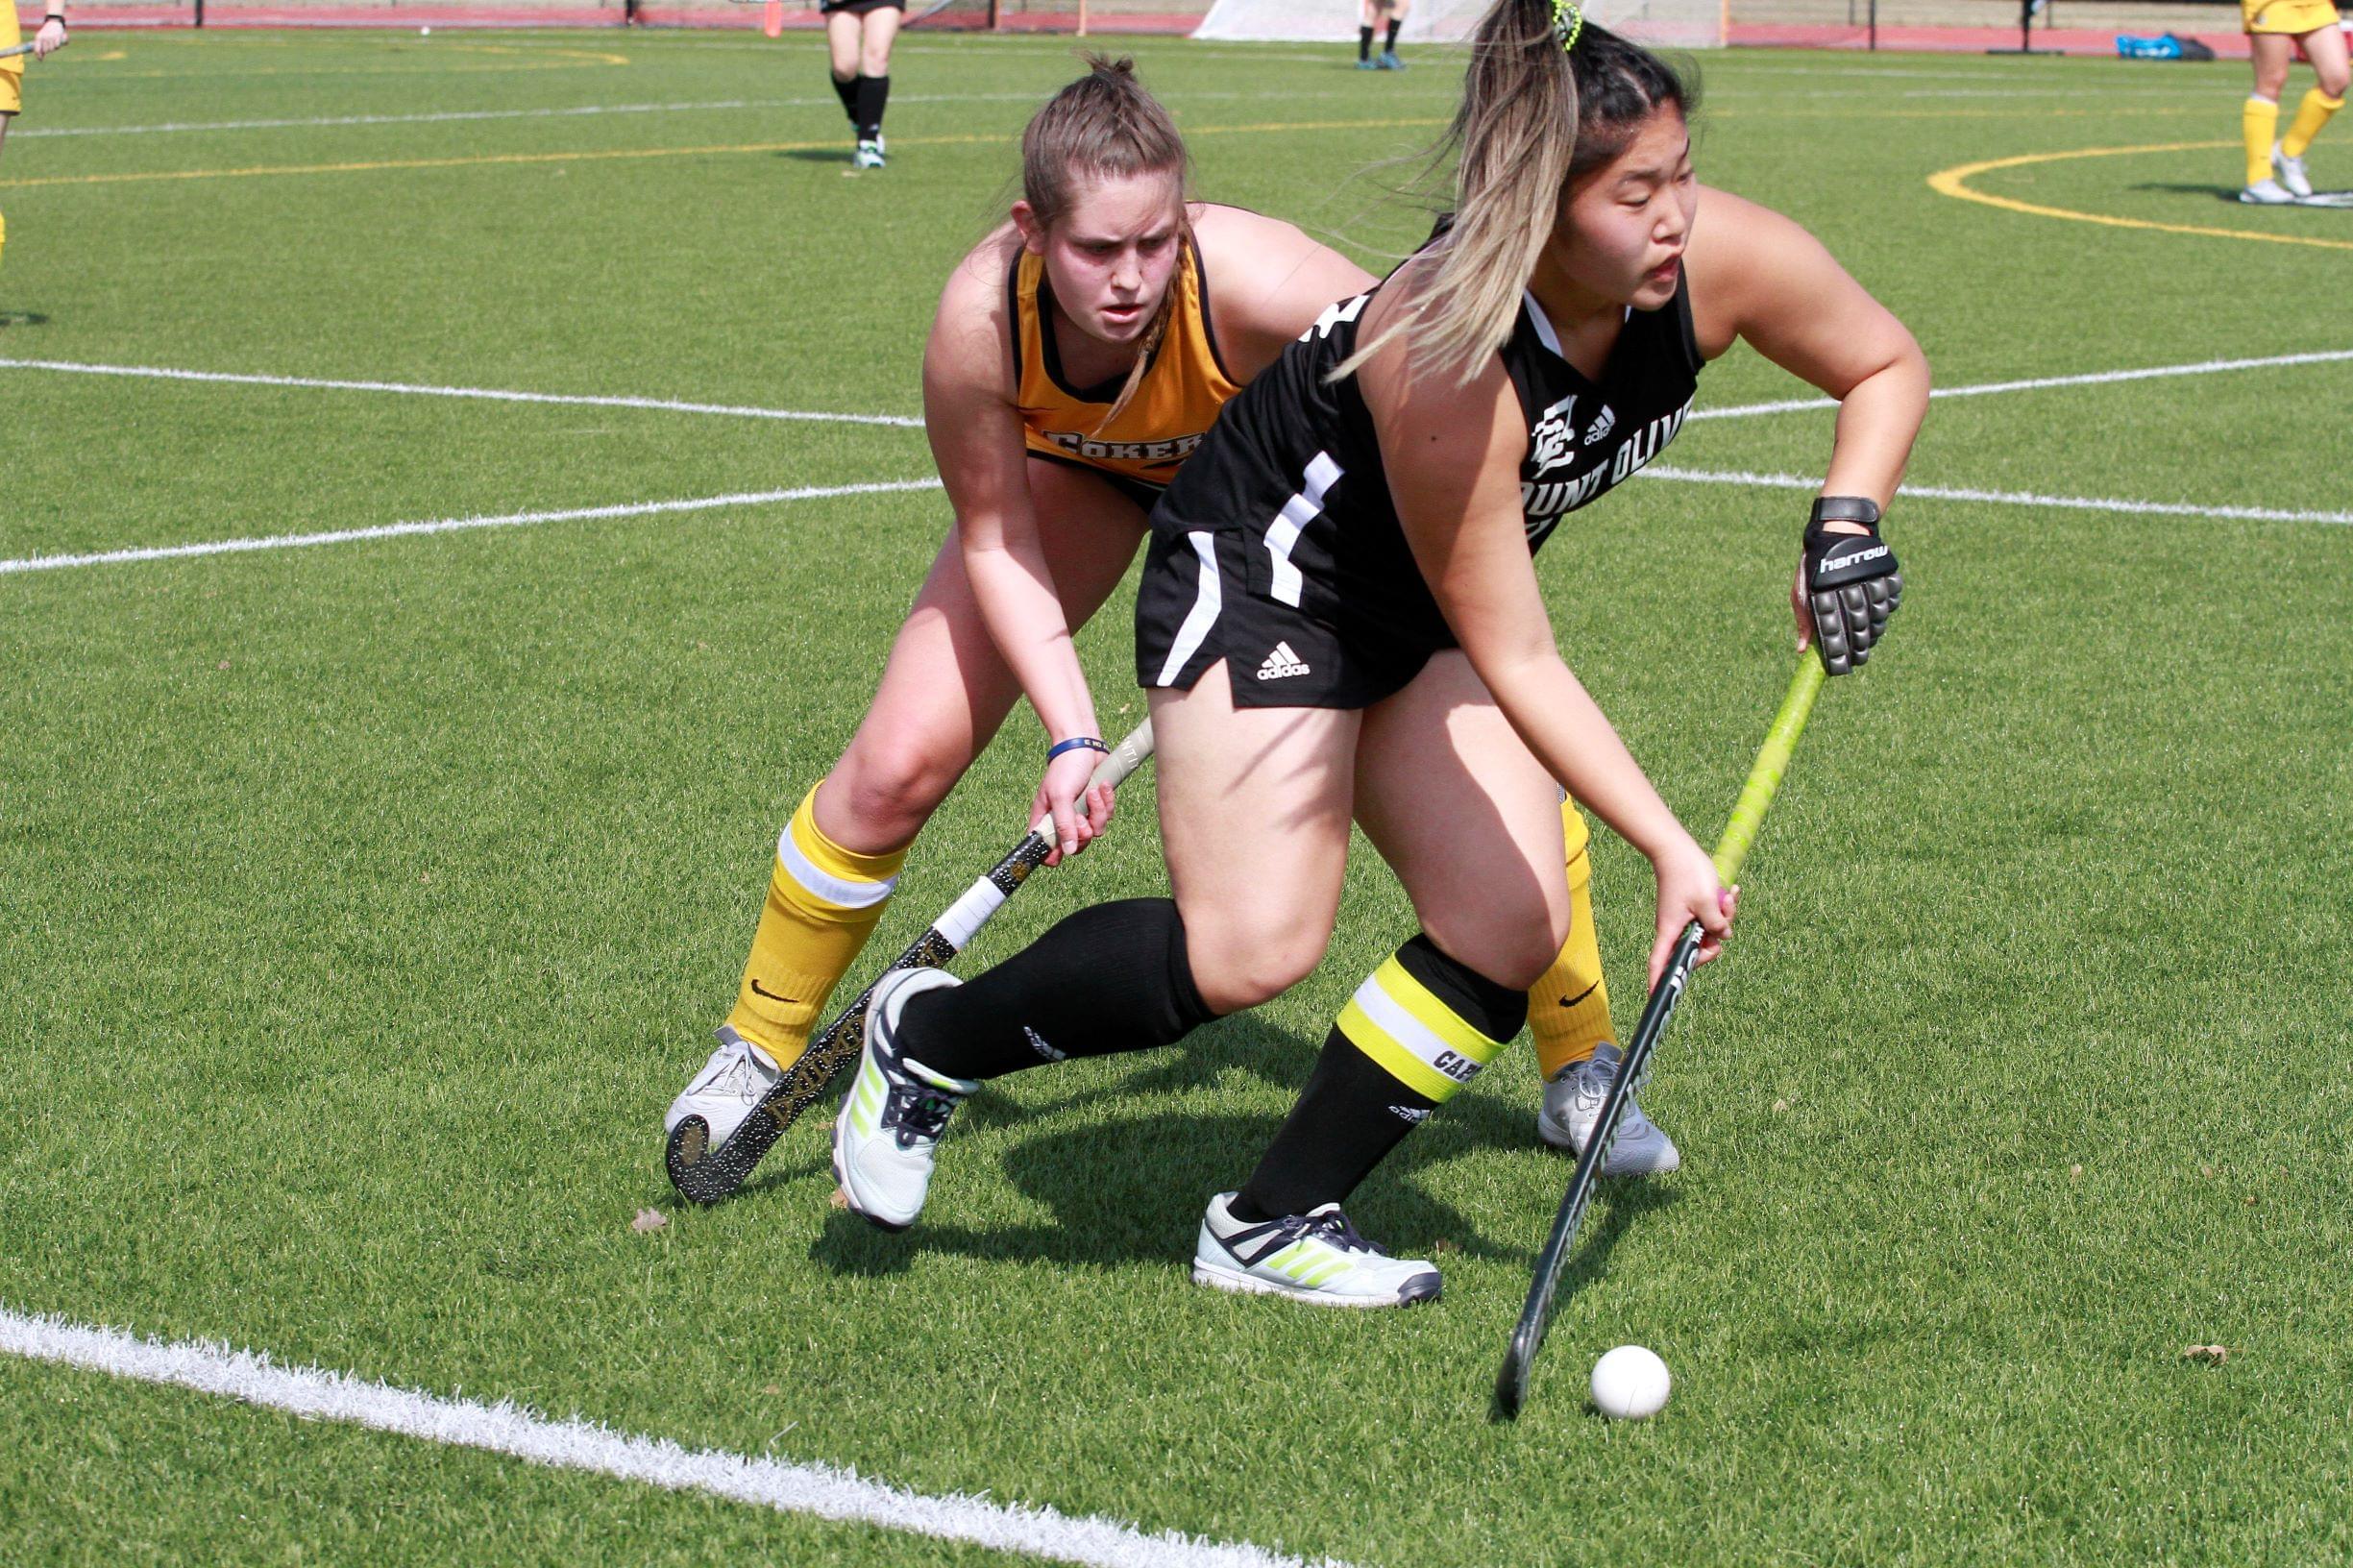 Field Hockey: Coker University At UMO (PHOTO GALLERY)